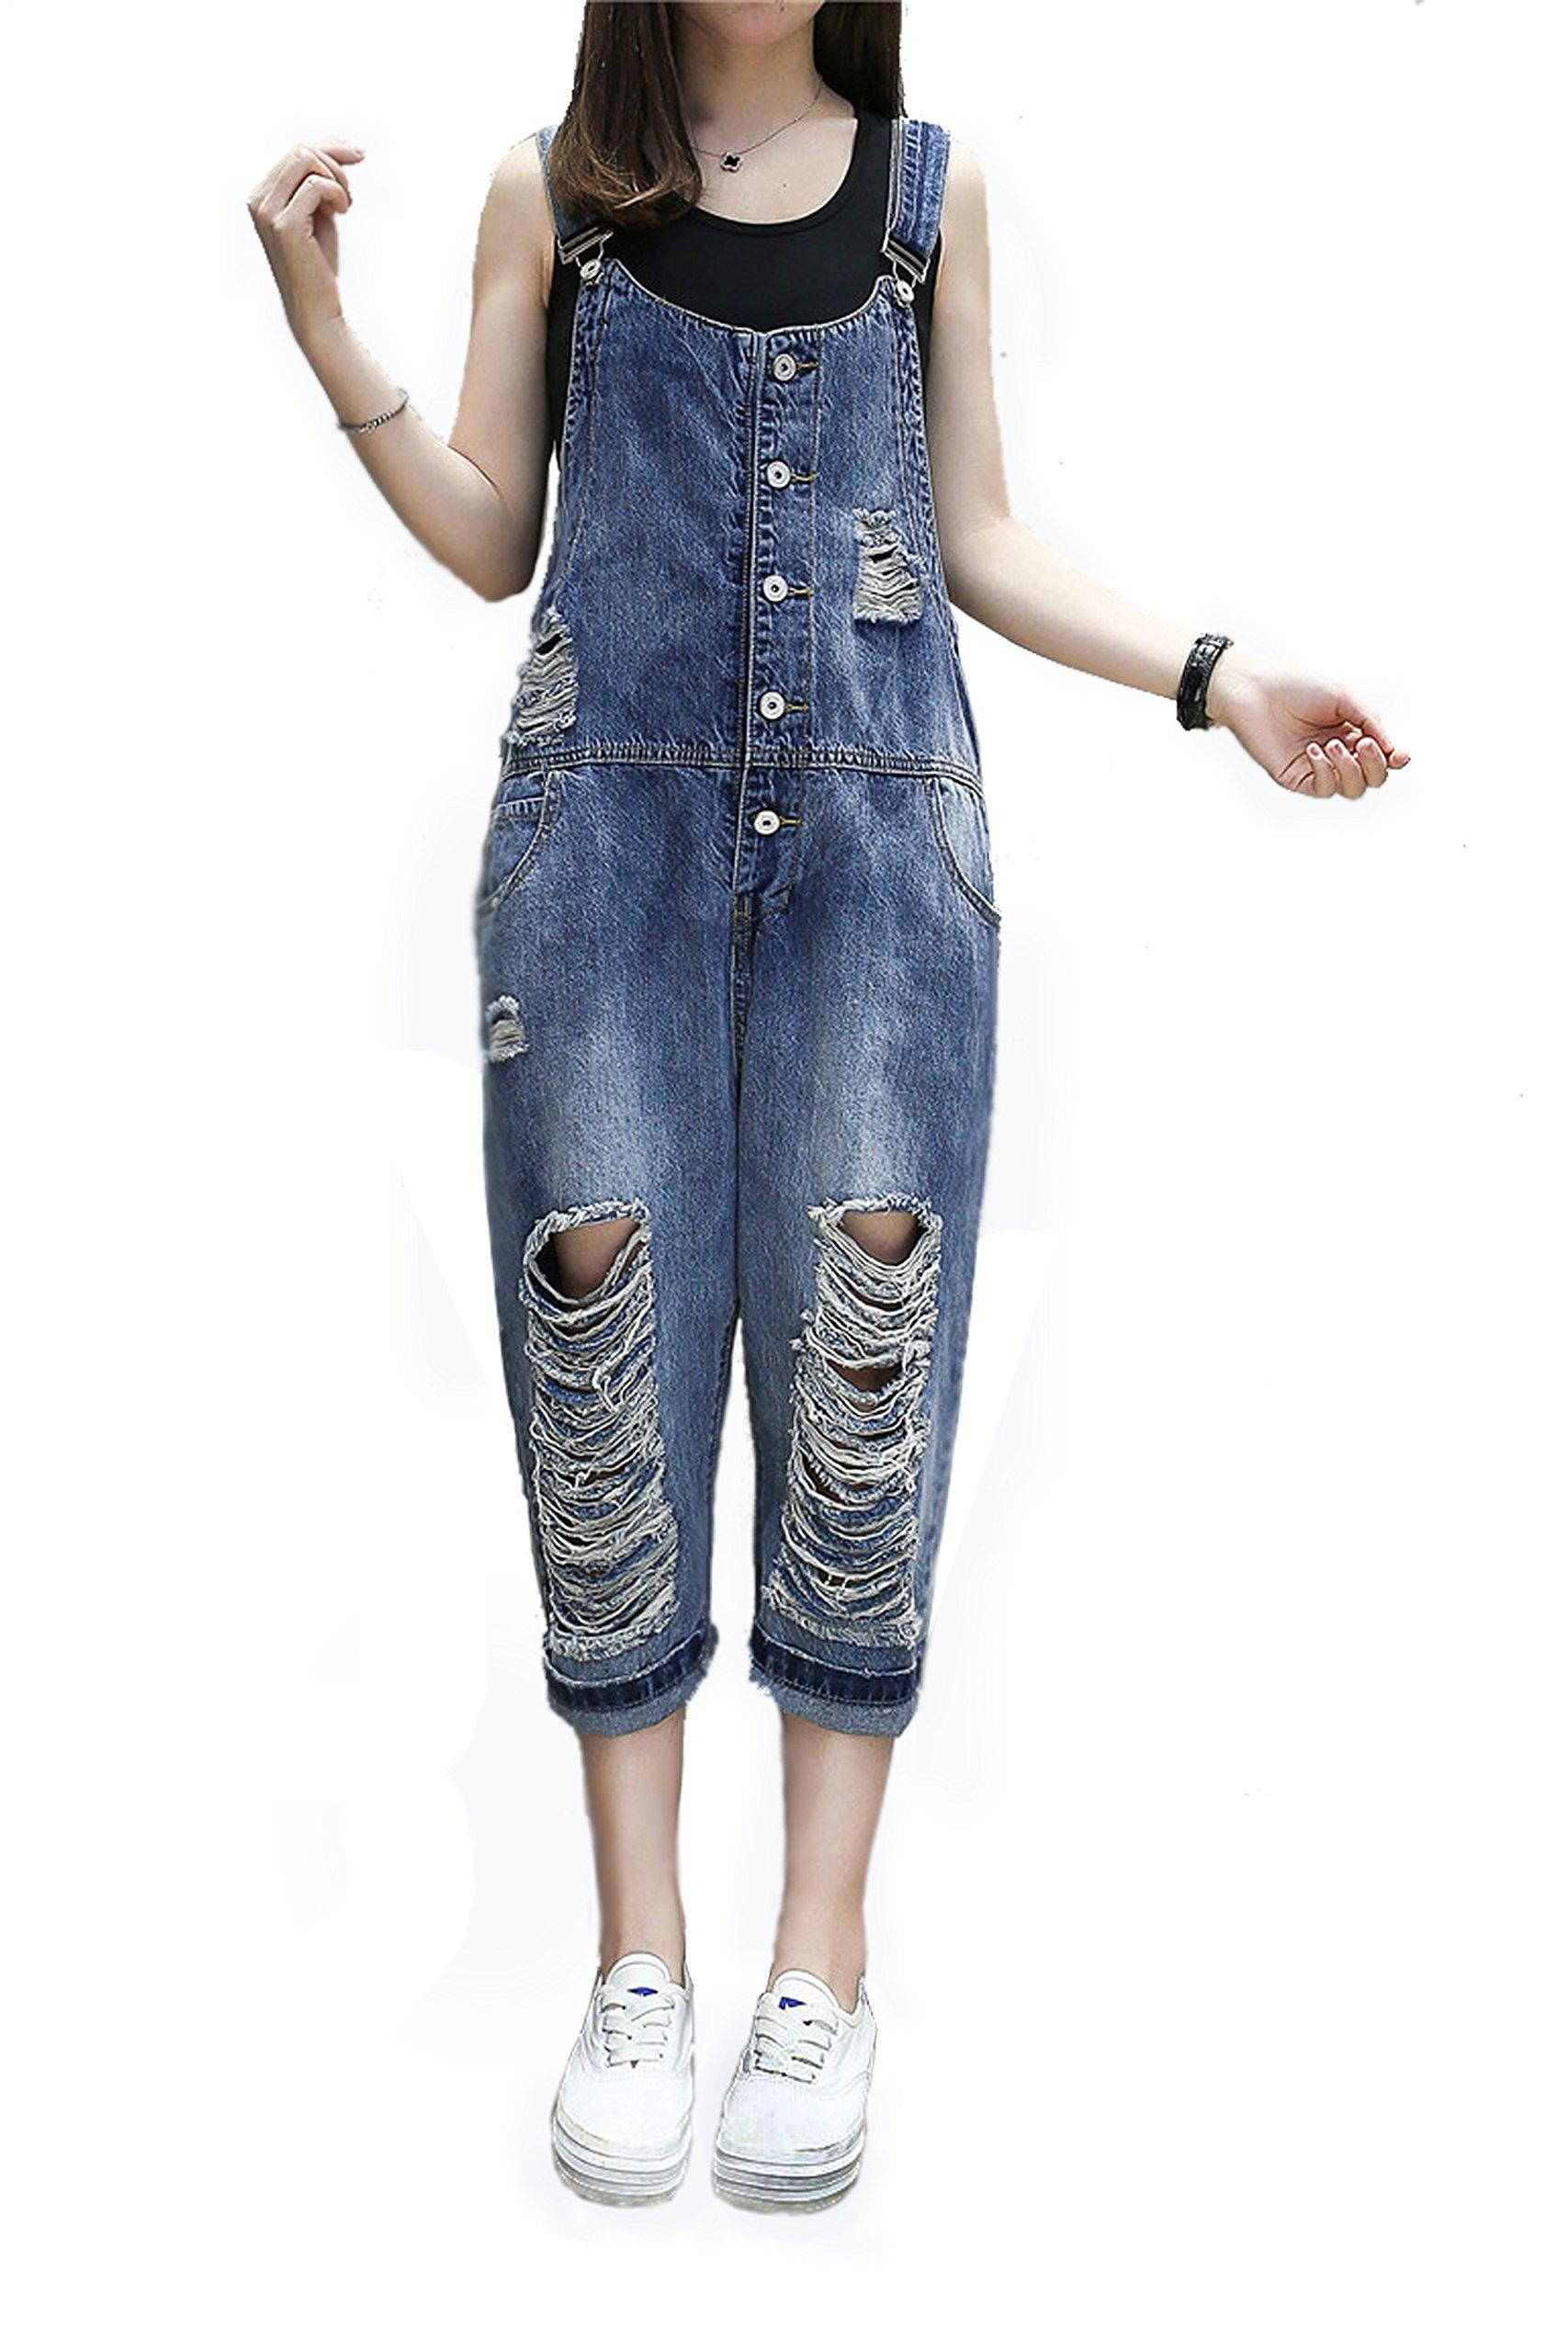 ead07f2027a yiboolai Overalls for Women Baggy Denim Overalls Jumpsuit Sleeveless Romper  Harem Jeans Pants